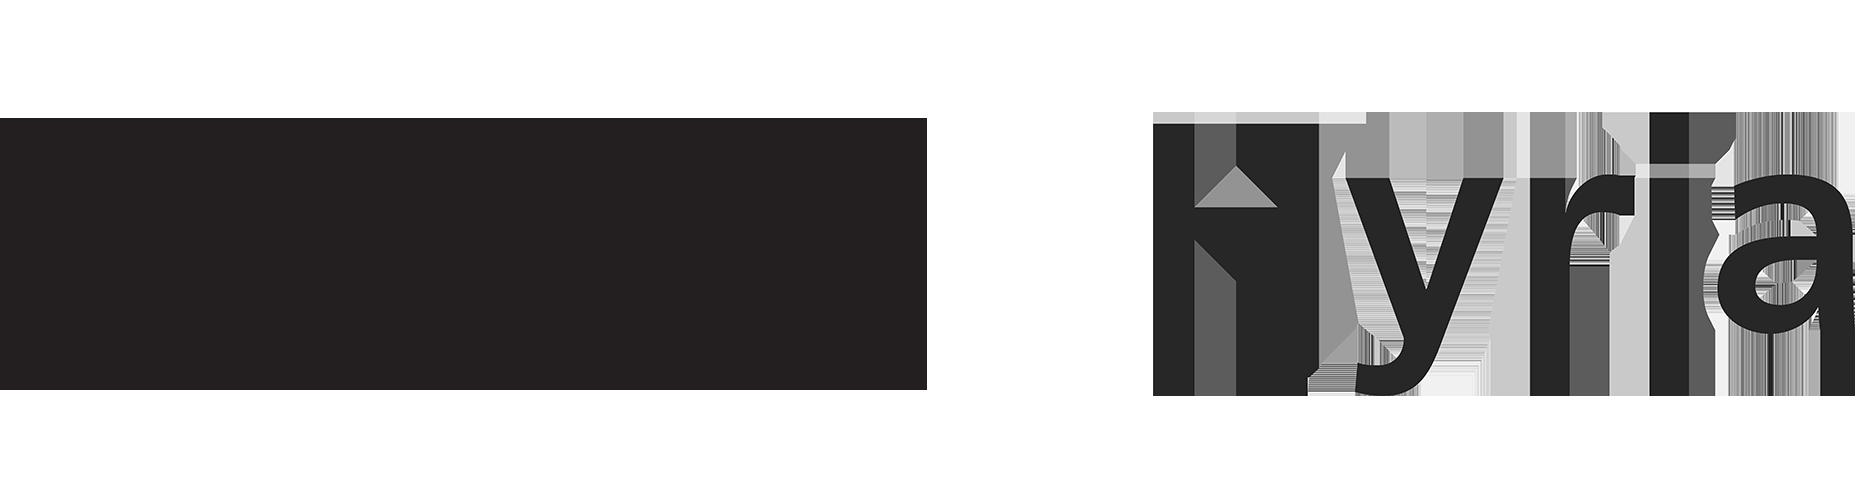 HAMKin ja Hyrian logot